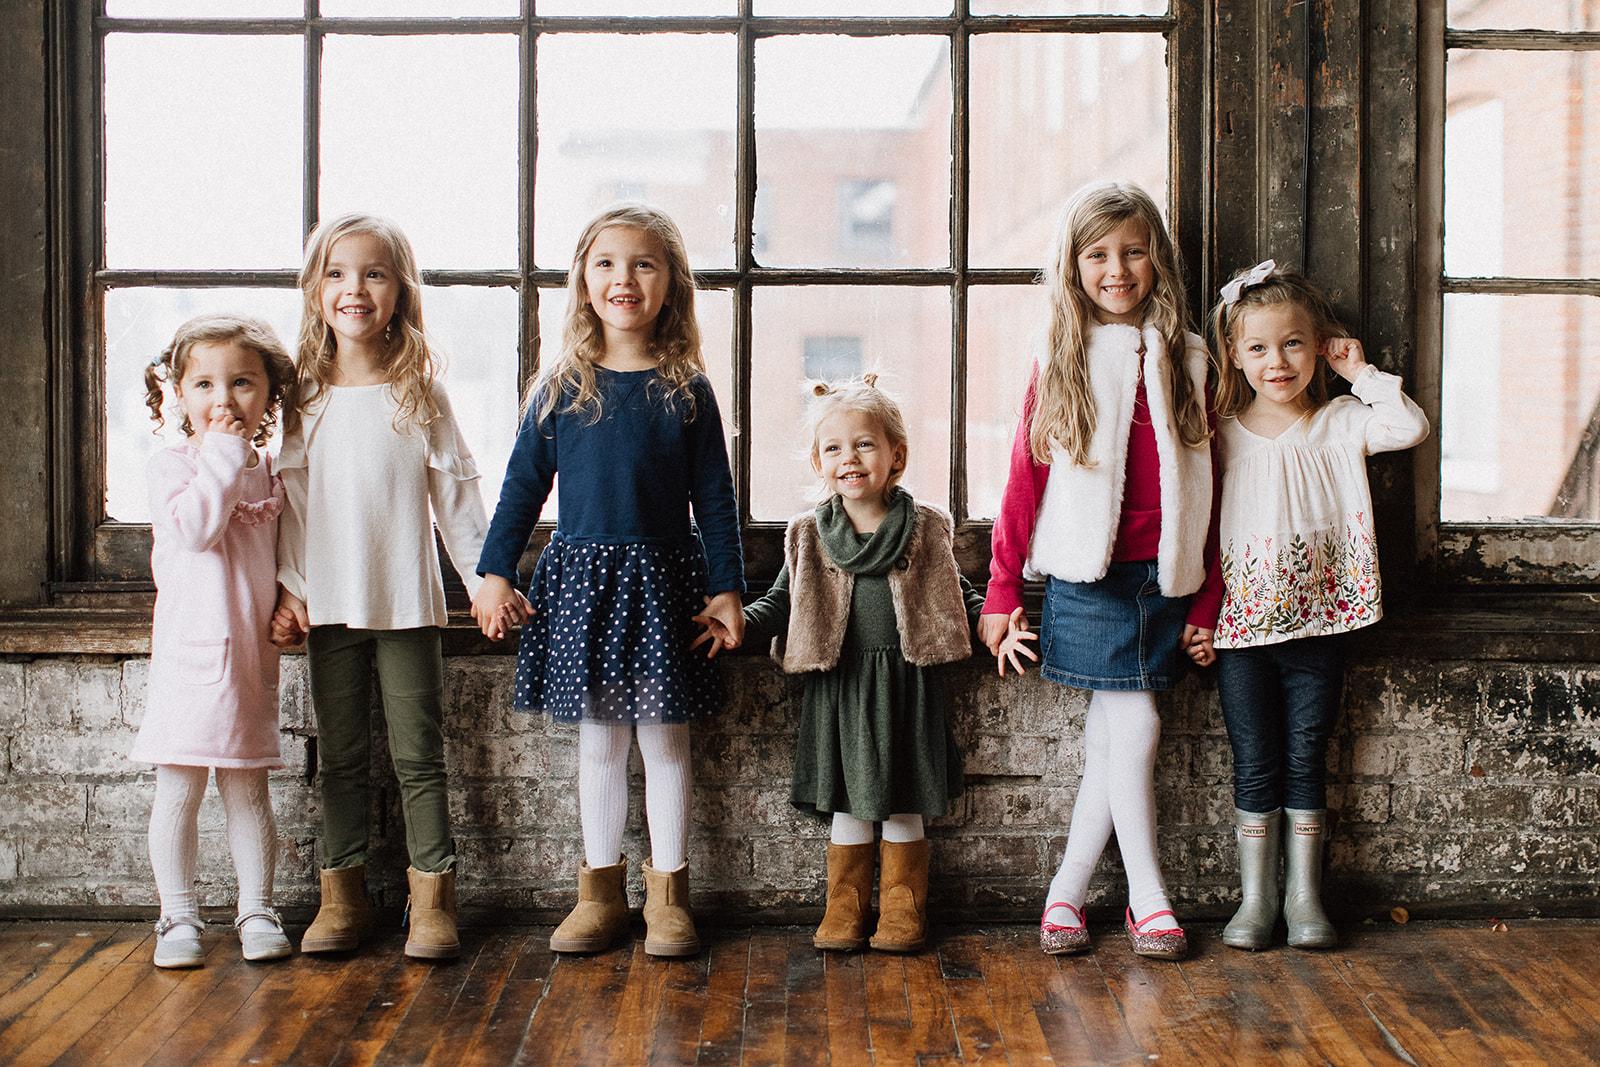 Waite-Family-2018-by-The-Brauns-078.jpg